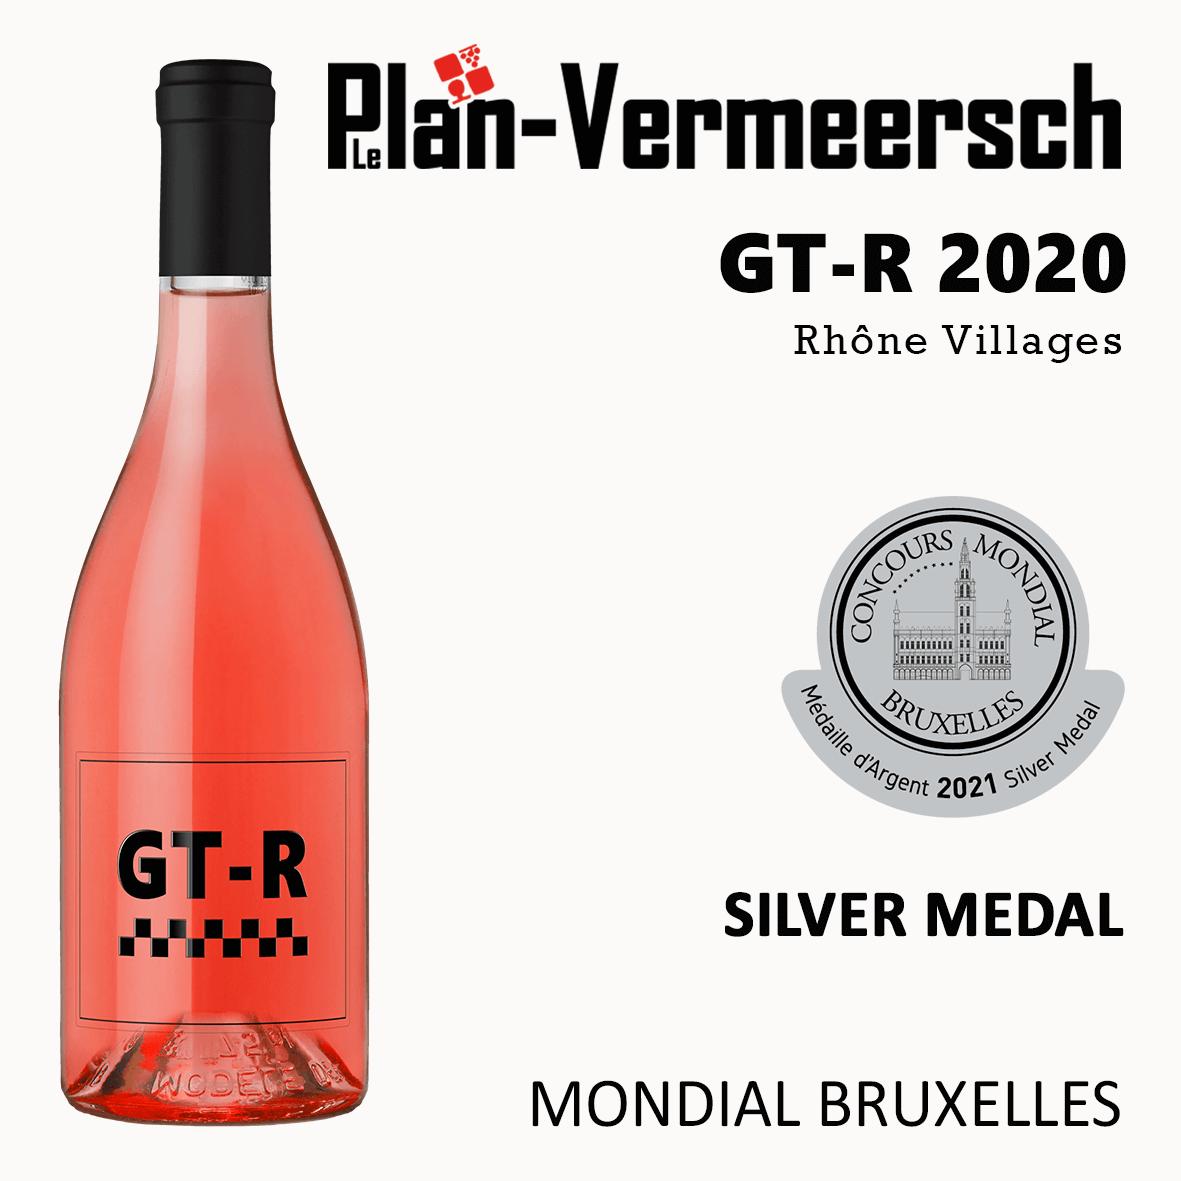 Bottle wine blend Grenache Mourvèdre Côtes du Rhône Villages GT-Rose mondial Bruxelles silver medal LePlan-Vermeersch